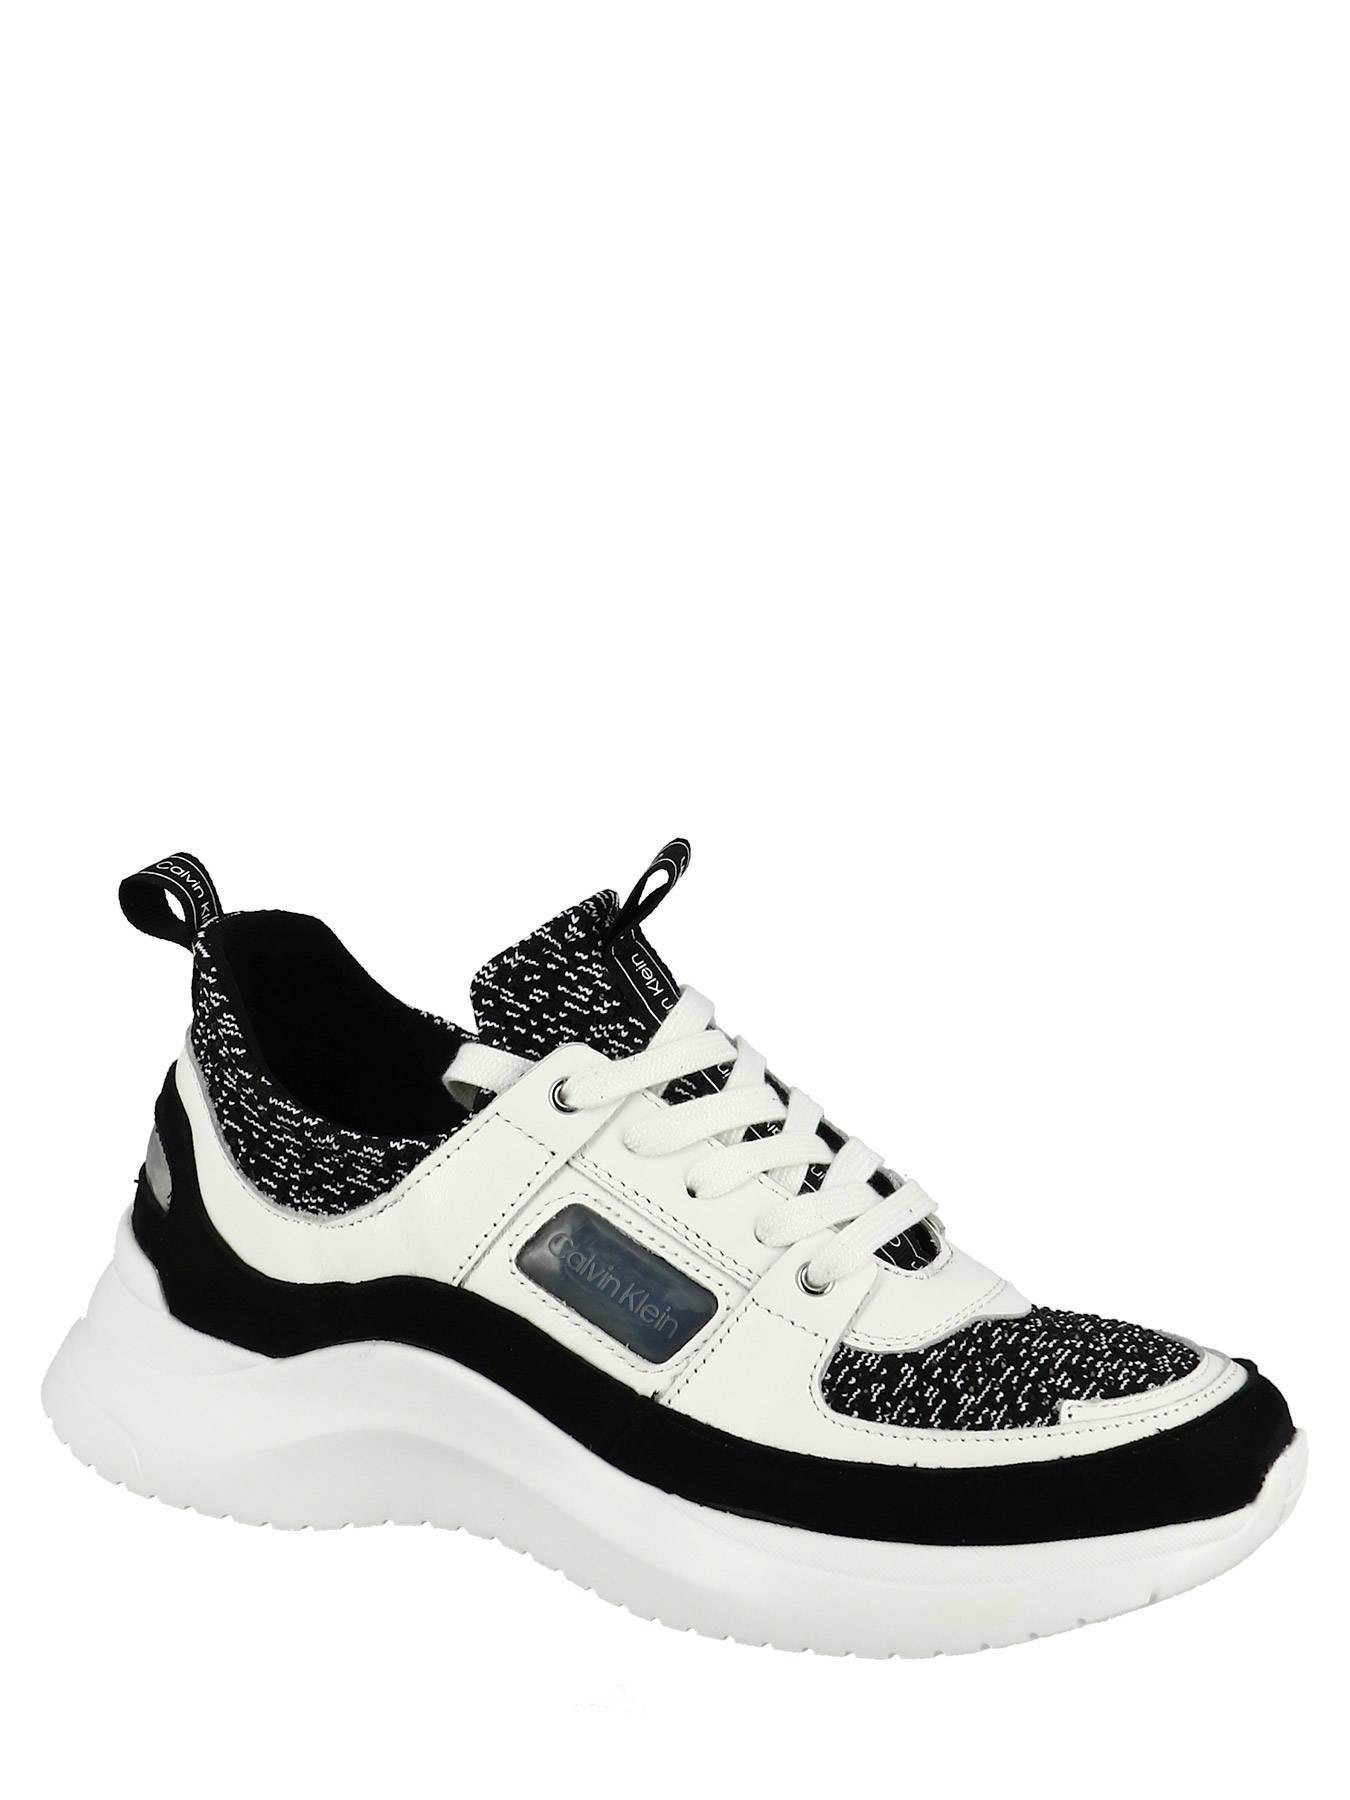 Calvin Klein Jeans Sneakers B4E4631